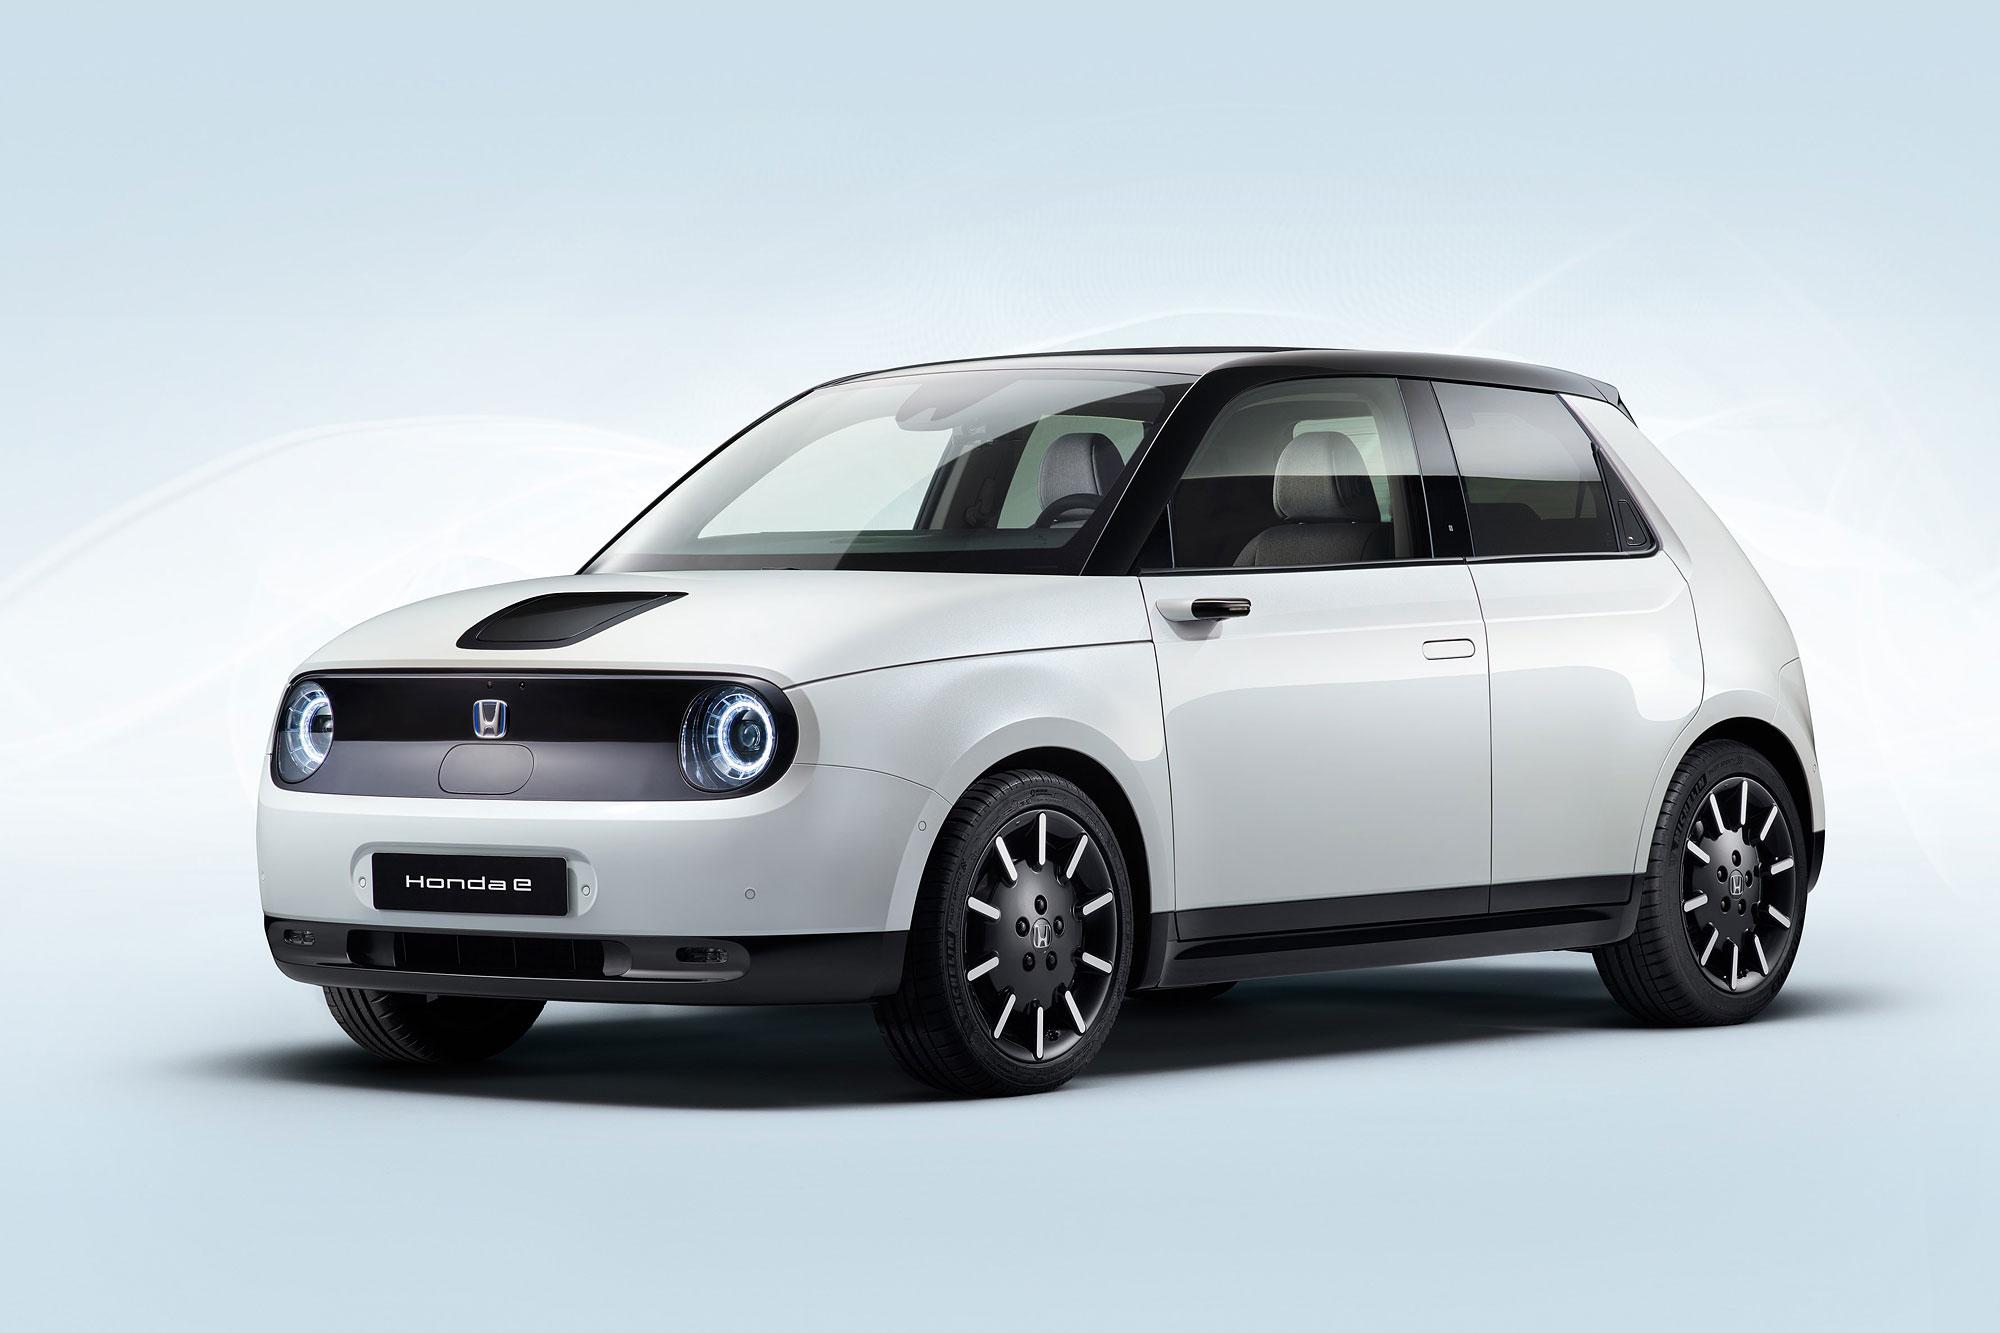 Honda e 量產版本設定在法蘭克福車展發表。